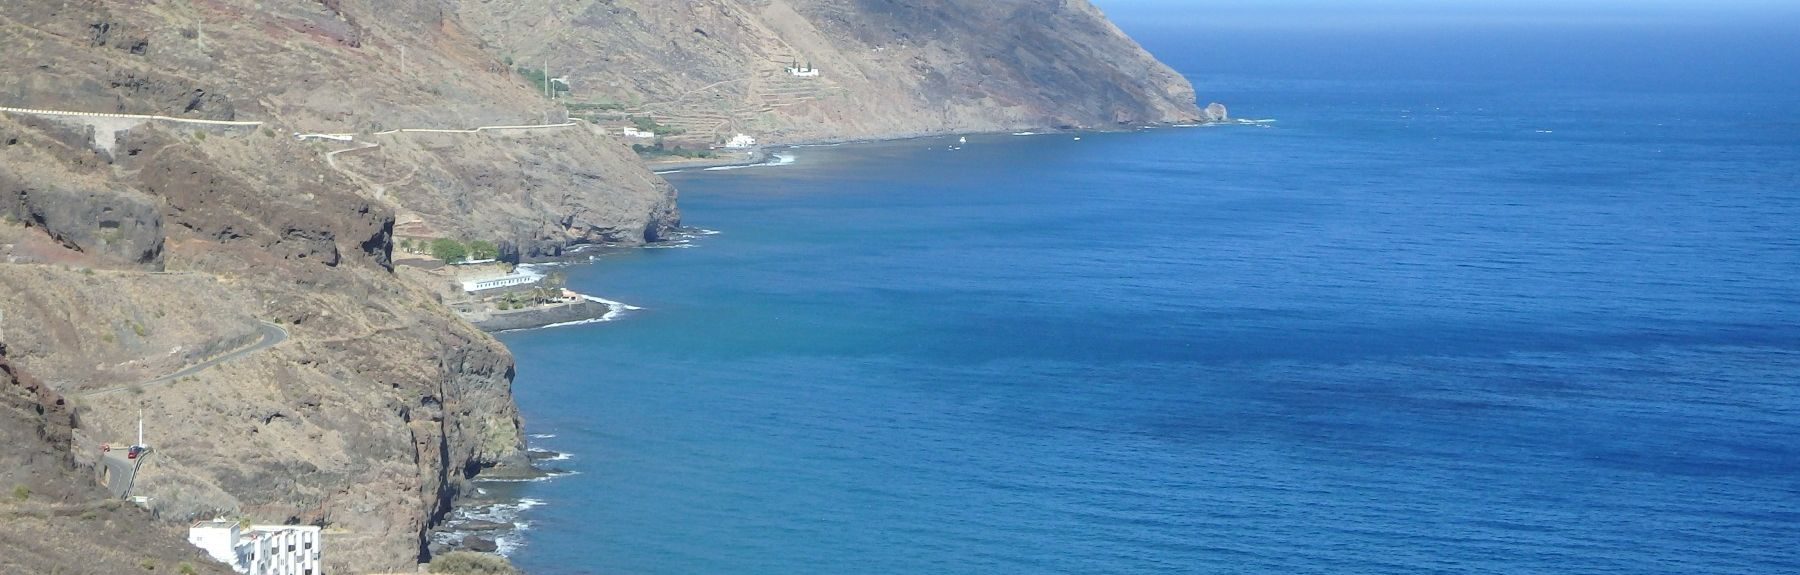 San Andrés, Santa Cruz de Tenerife, De Kanariske Øer, Spanien